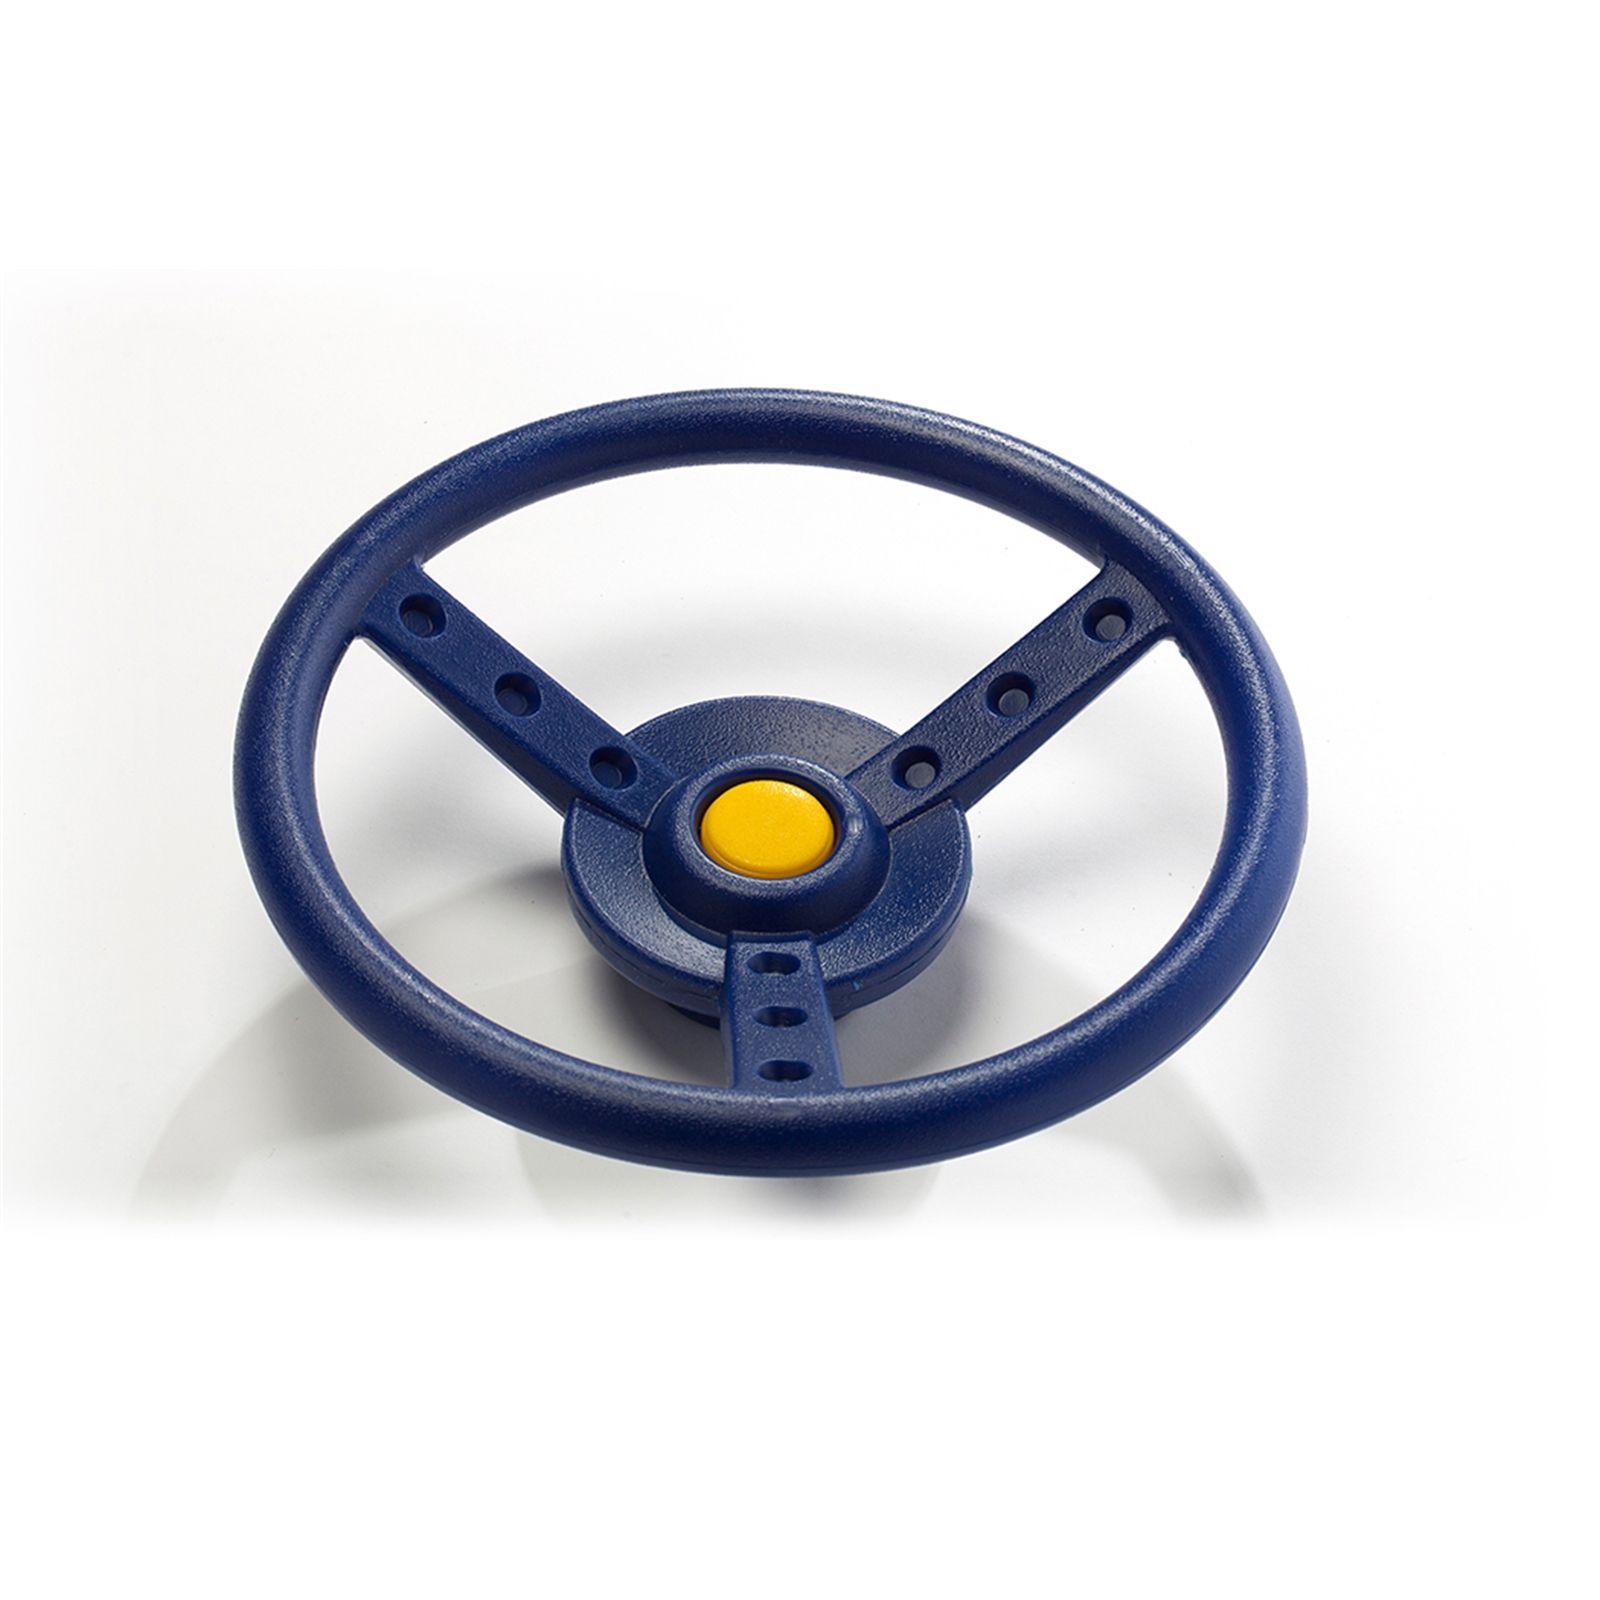 Find Swing Slide Climb Blue Plastic Steering Wheel at